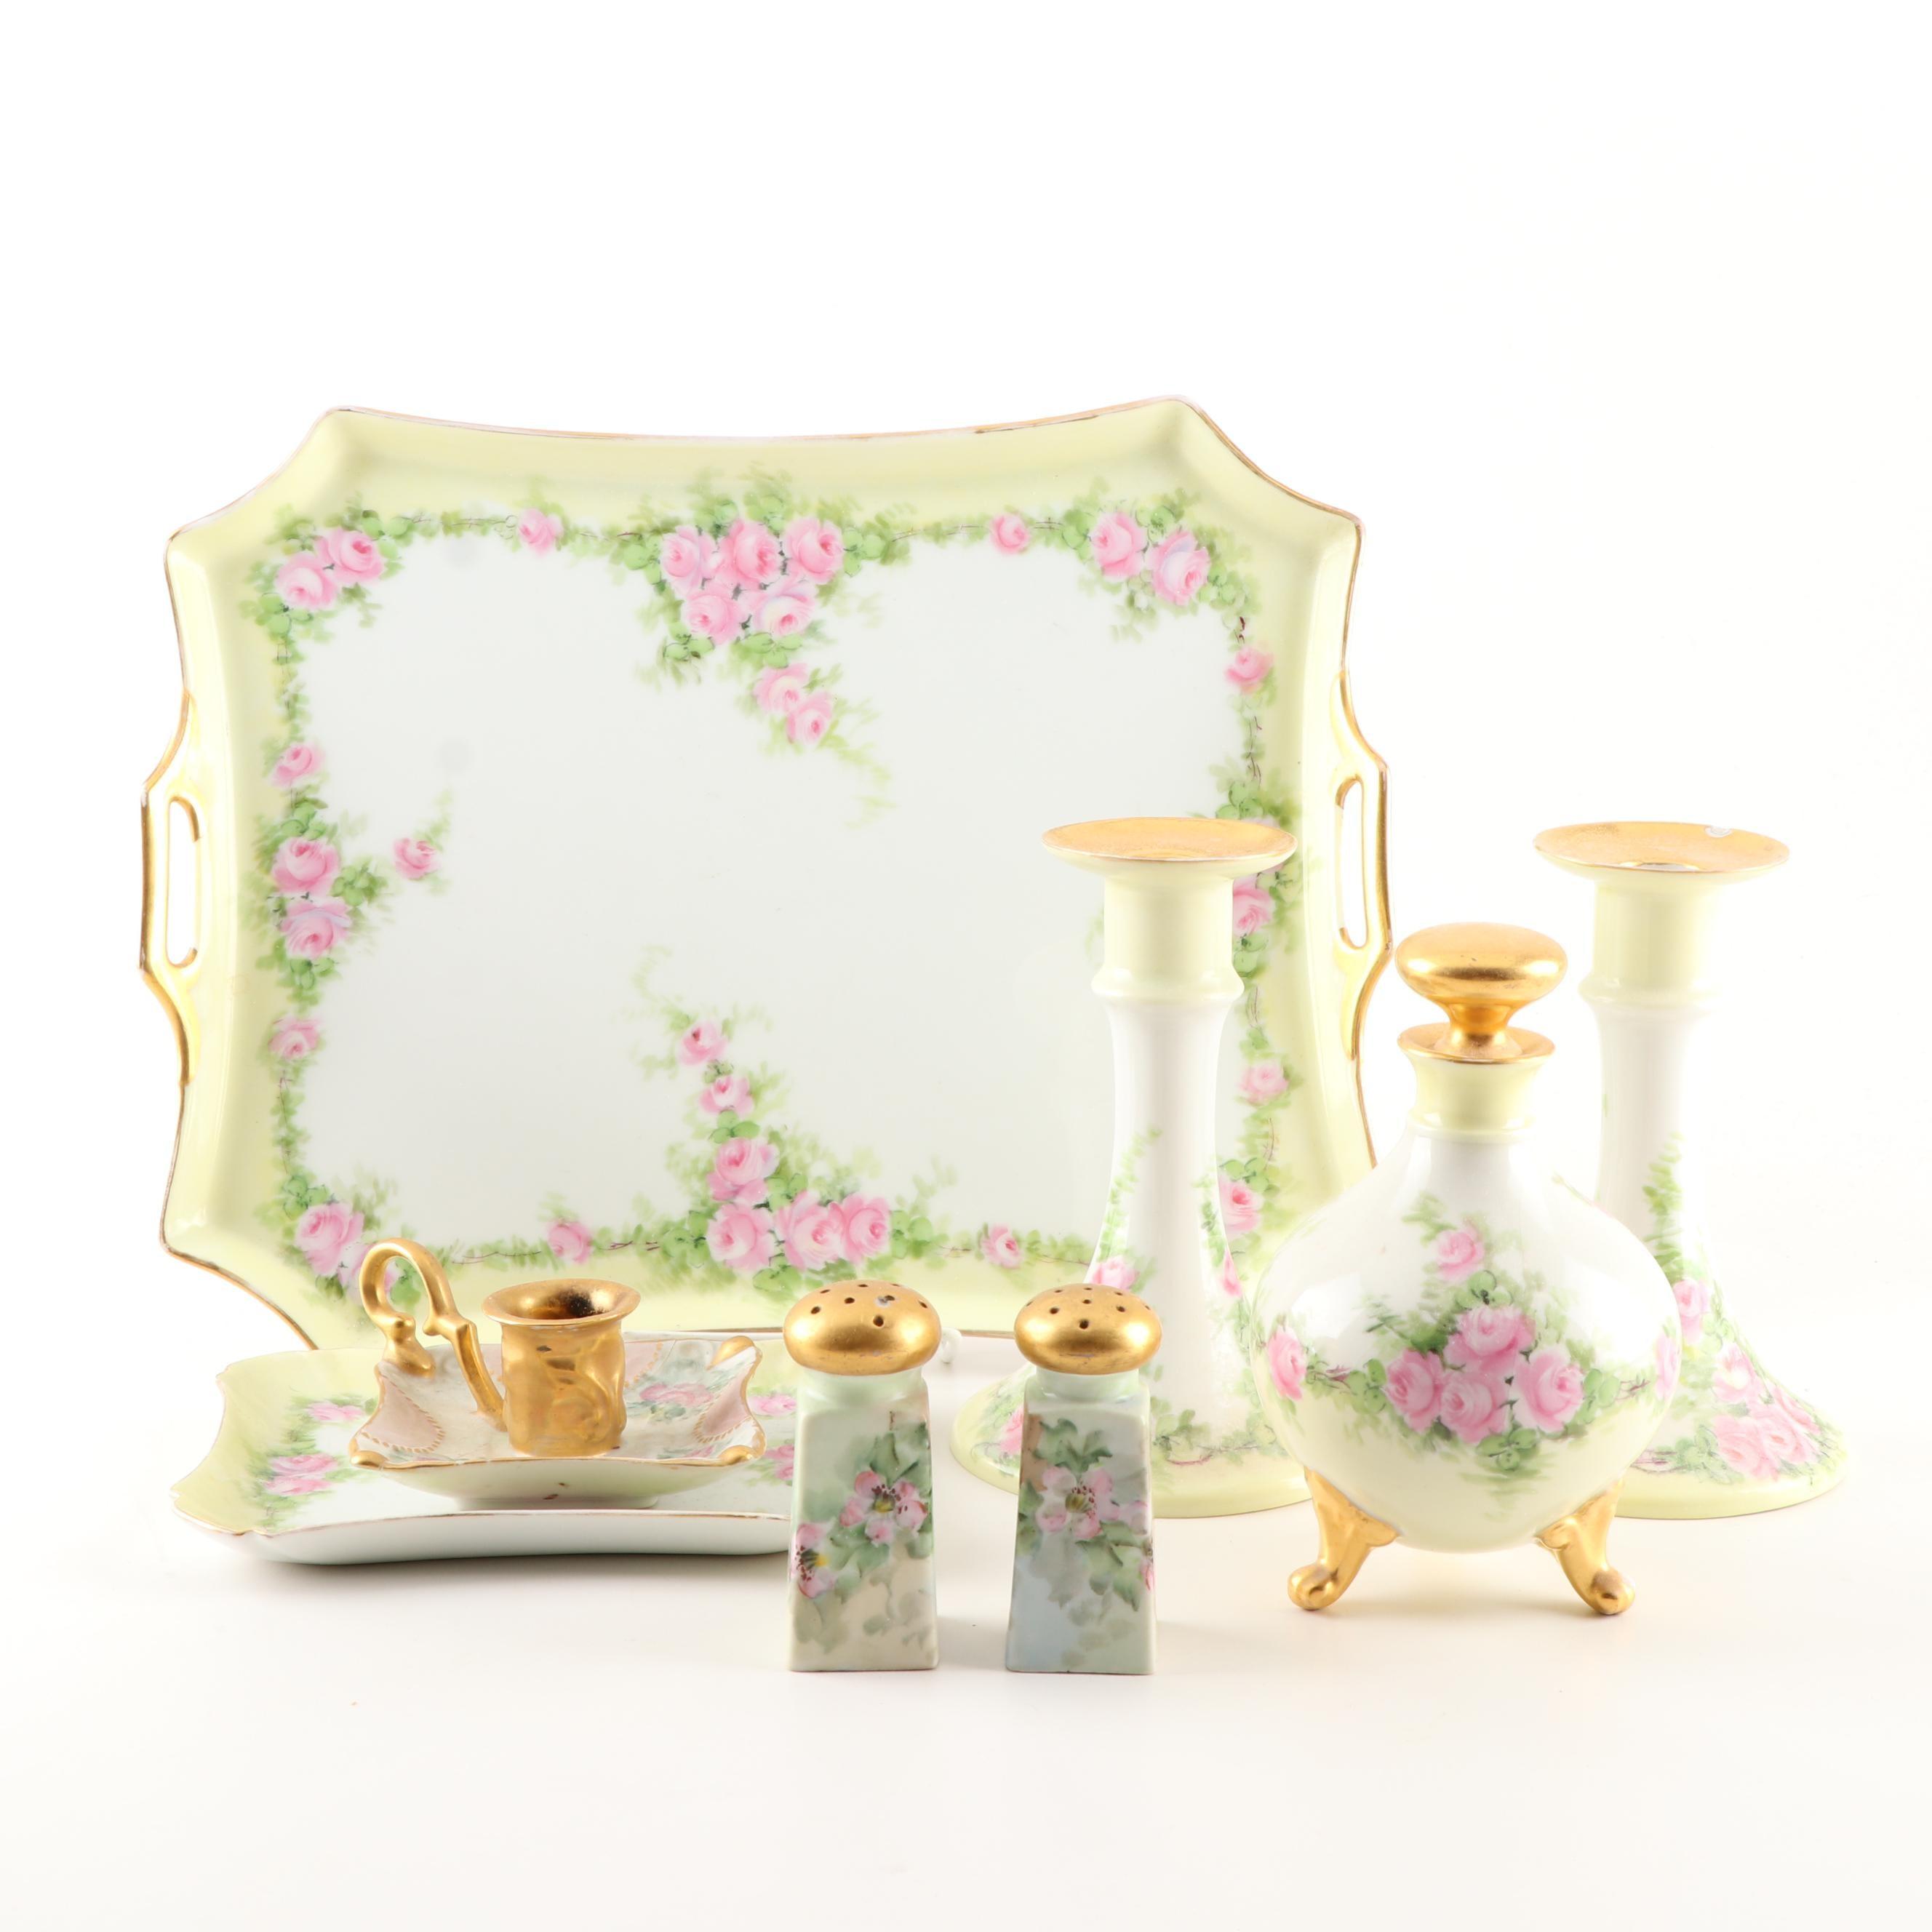 Rosenthal Selb-Bavaria Hand-Painted Porcelain Tableware